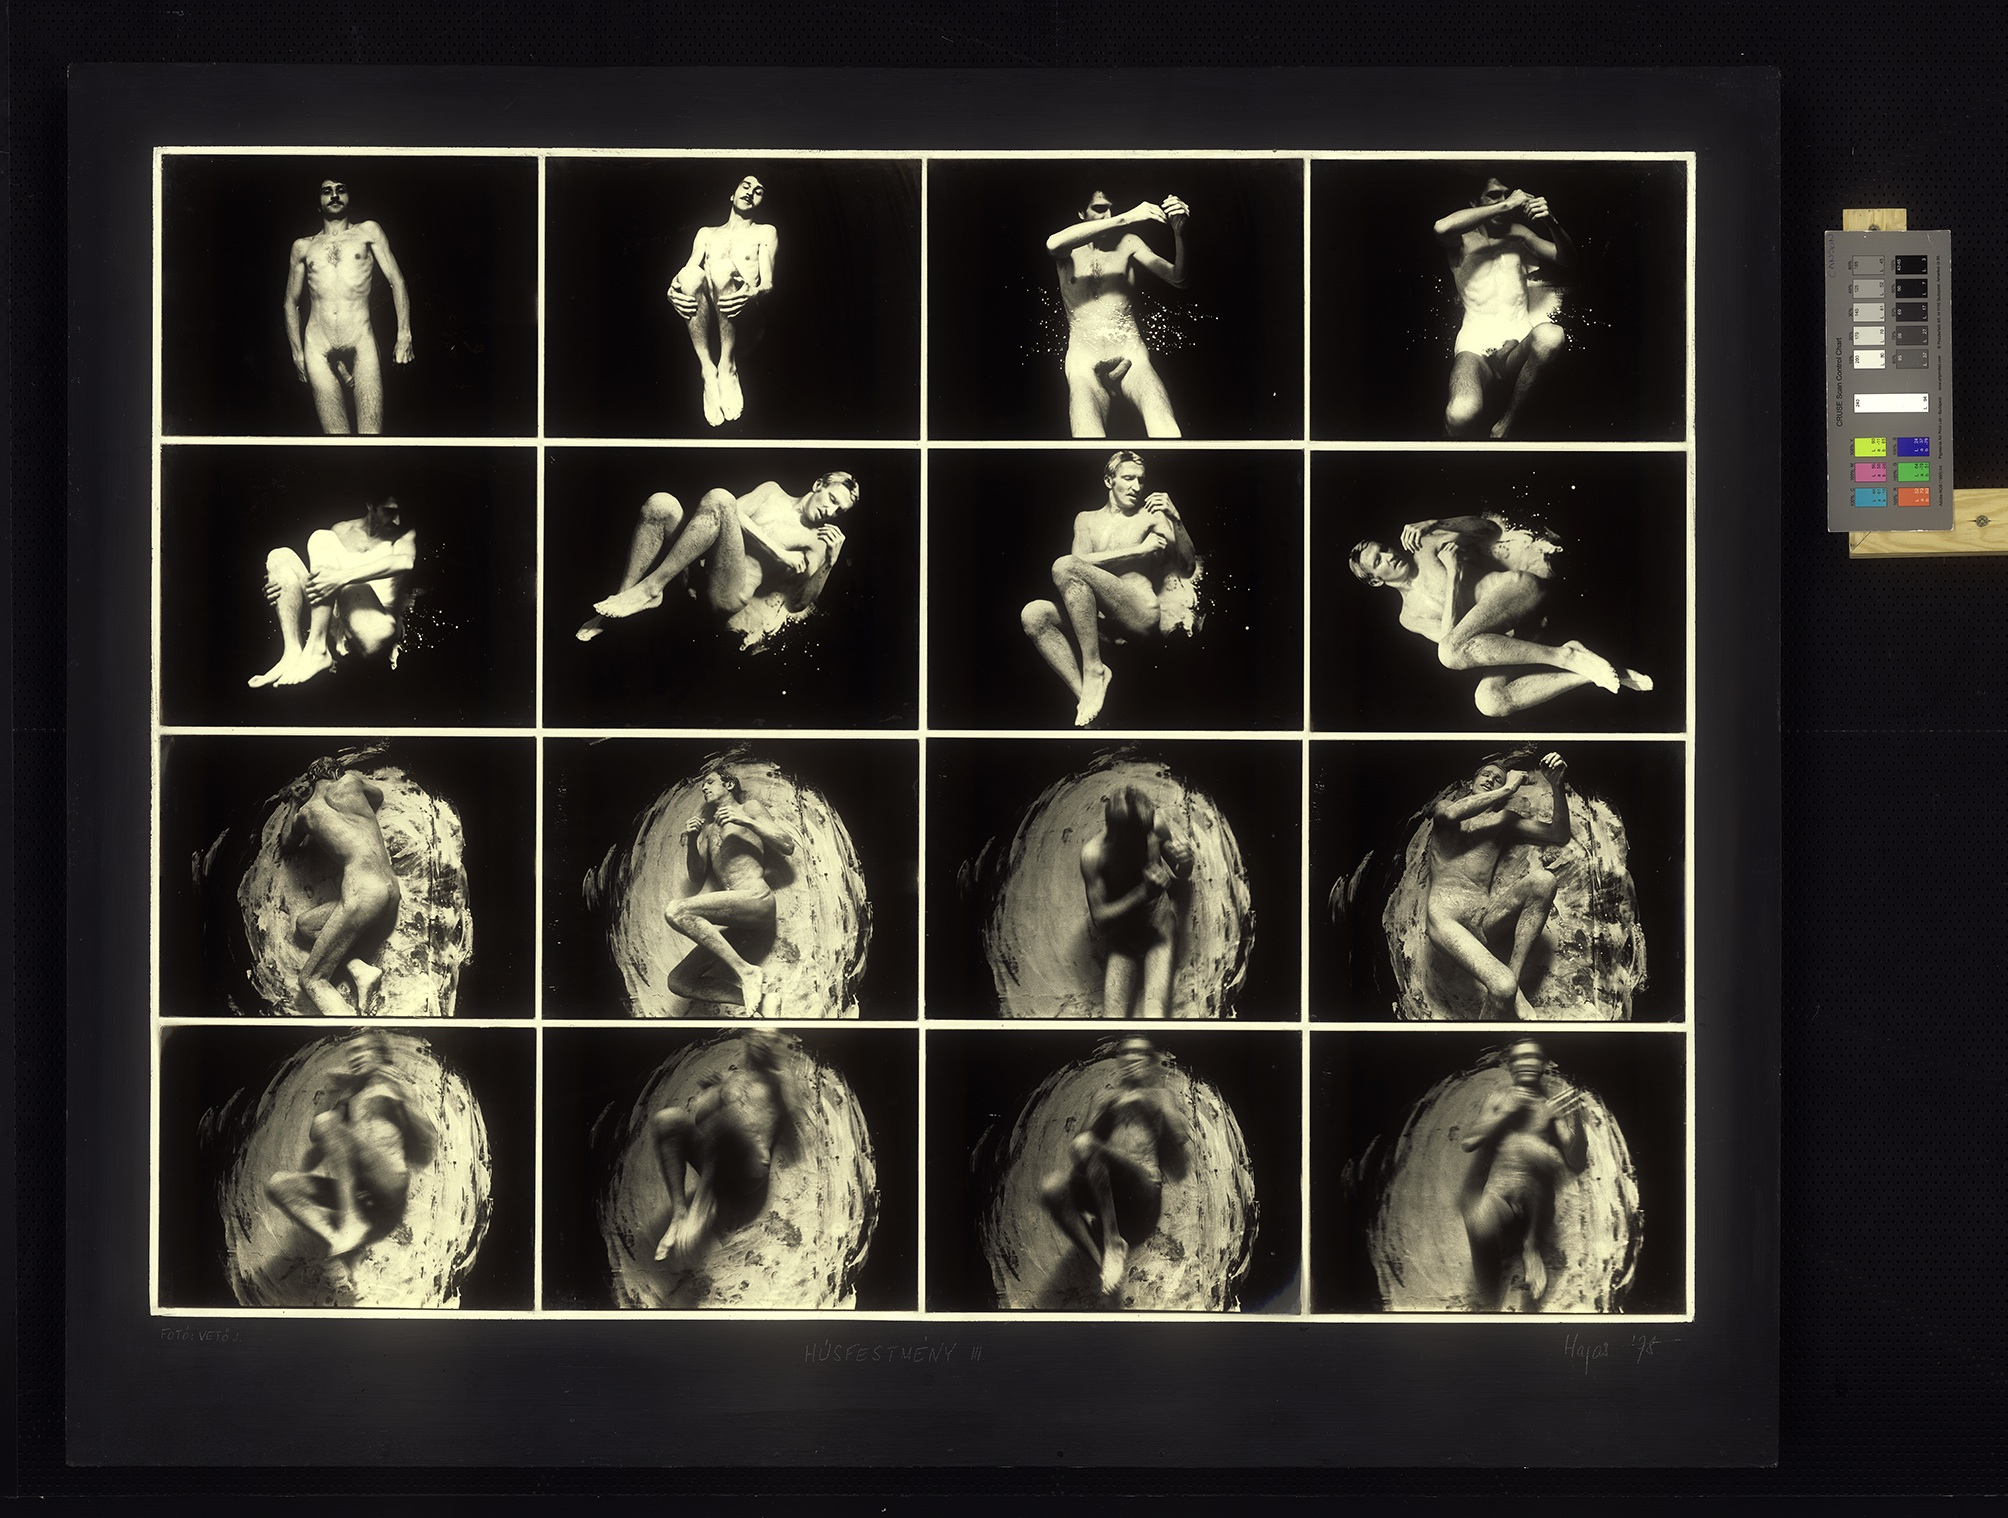 Tibor Hajas, Húsfestménu III (Flesh Painting No. 3), 1978. Sølvgelatin-print og dispersjonsmaling på tre. Lån fra Ludwig Museum – Museum of Contemporary Art, Budapest. Tibor Hajas, Dániel Jázon Frankl og BONO 2019. Foto: János Vetö